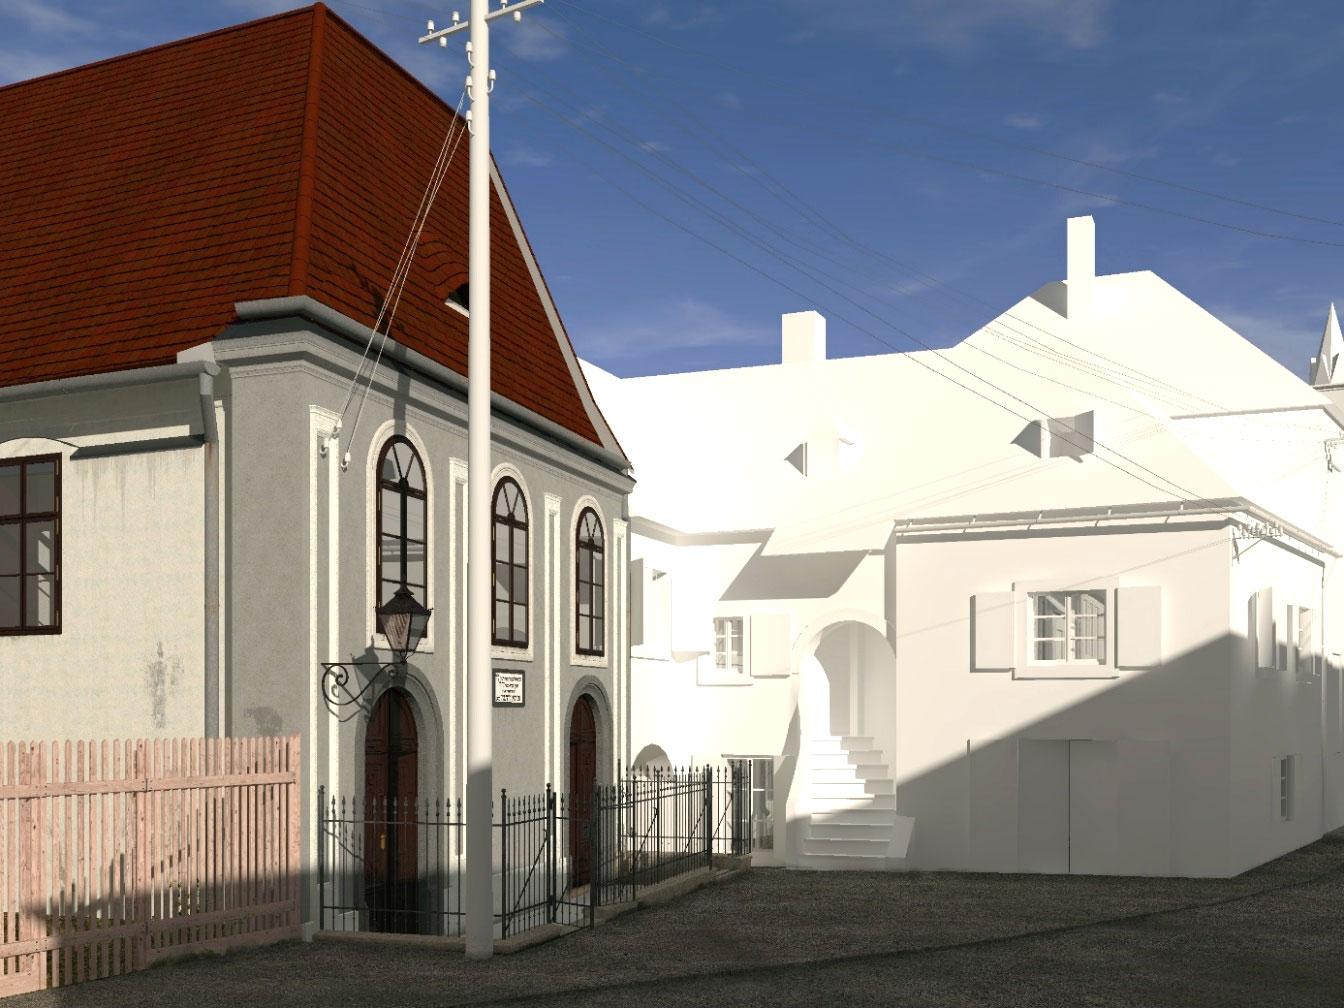 Eingangssituation der Synagoge mit Nachbarhaus Abeles